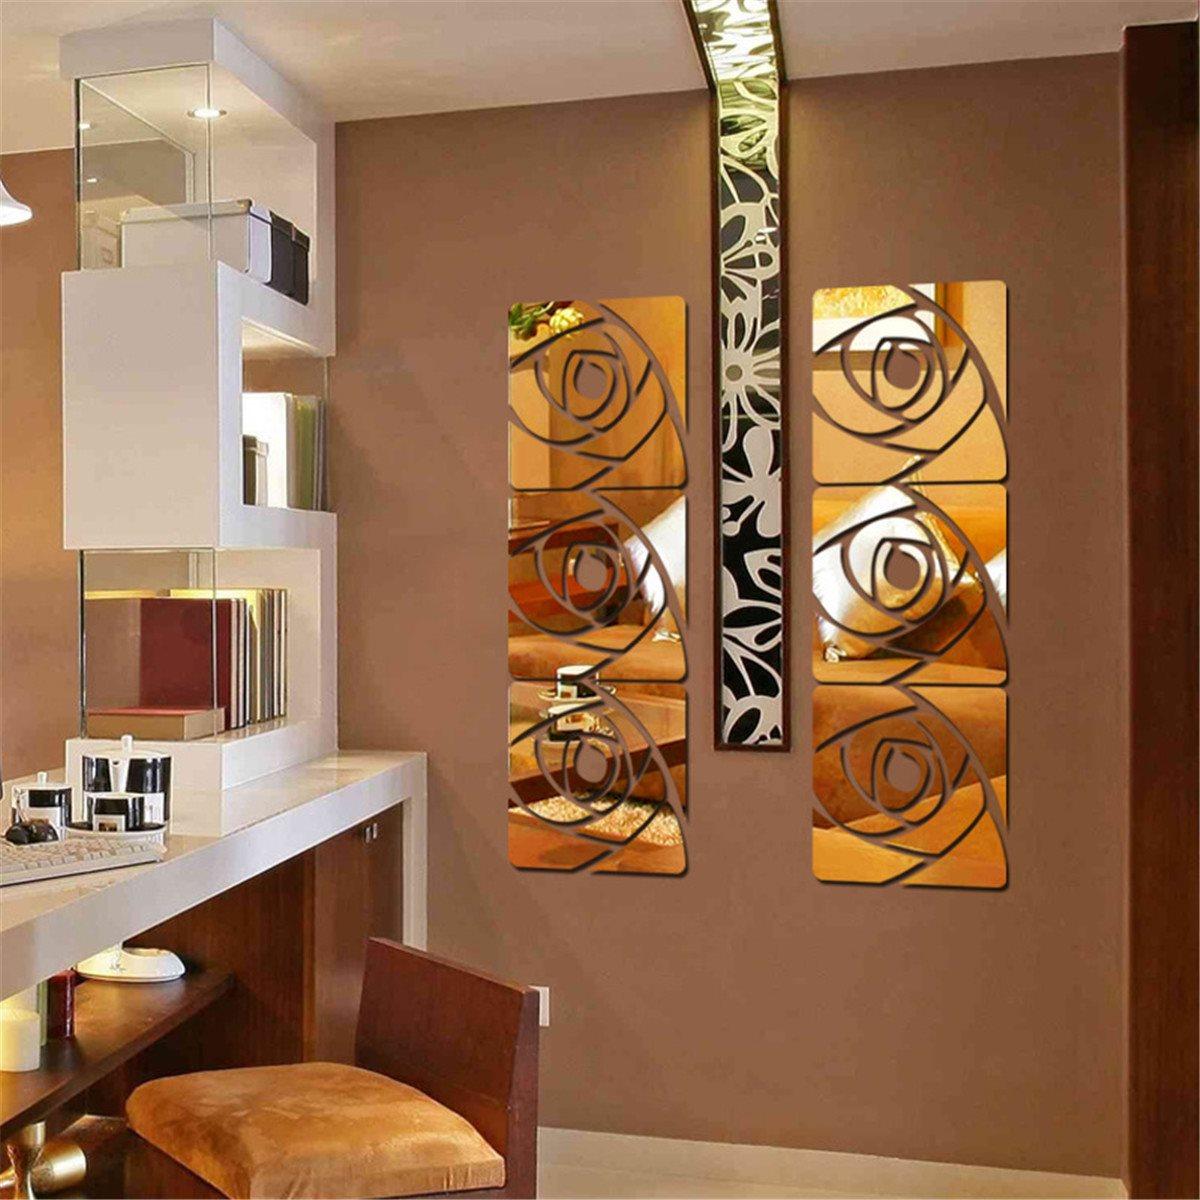 online get cheap free shipping modern furniture aliexpresscom  - d mirror wall sticker rose pettern acrylic modern for home decoration roomdinner room kitchen decal